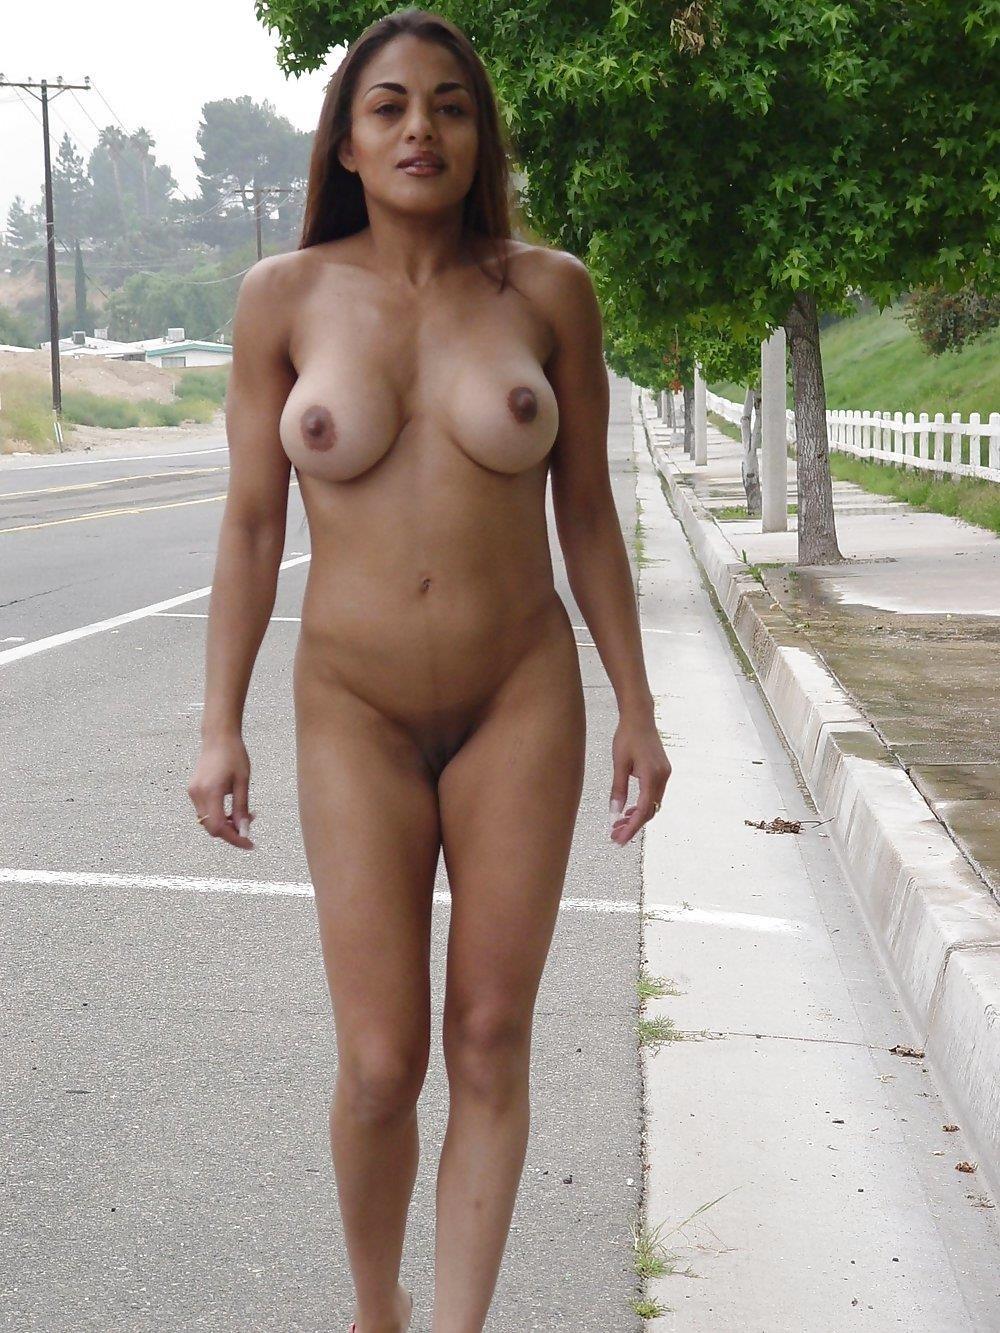 Road side public sex-4691